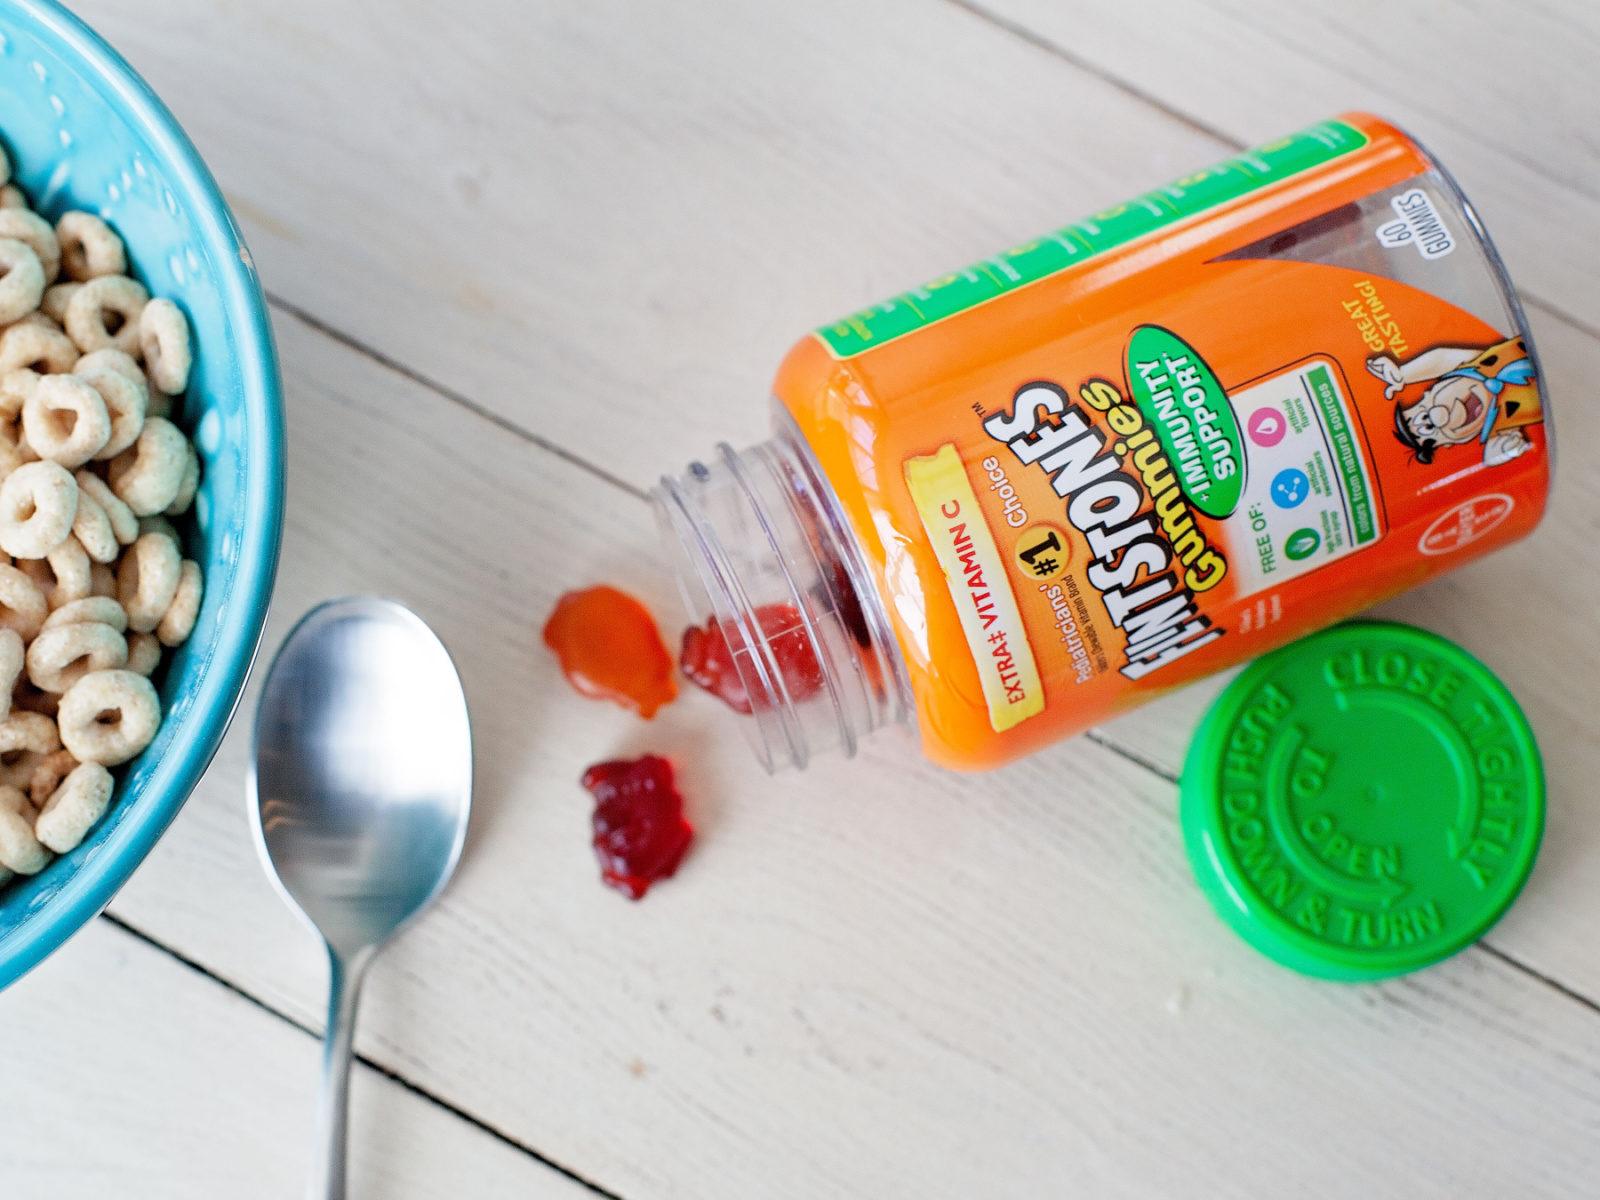 Flintstones Vitamins As Low As $2.59 At Publix on I Heart Publix 1